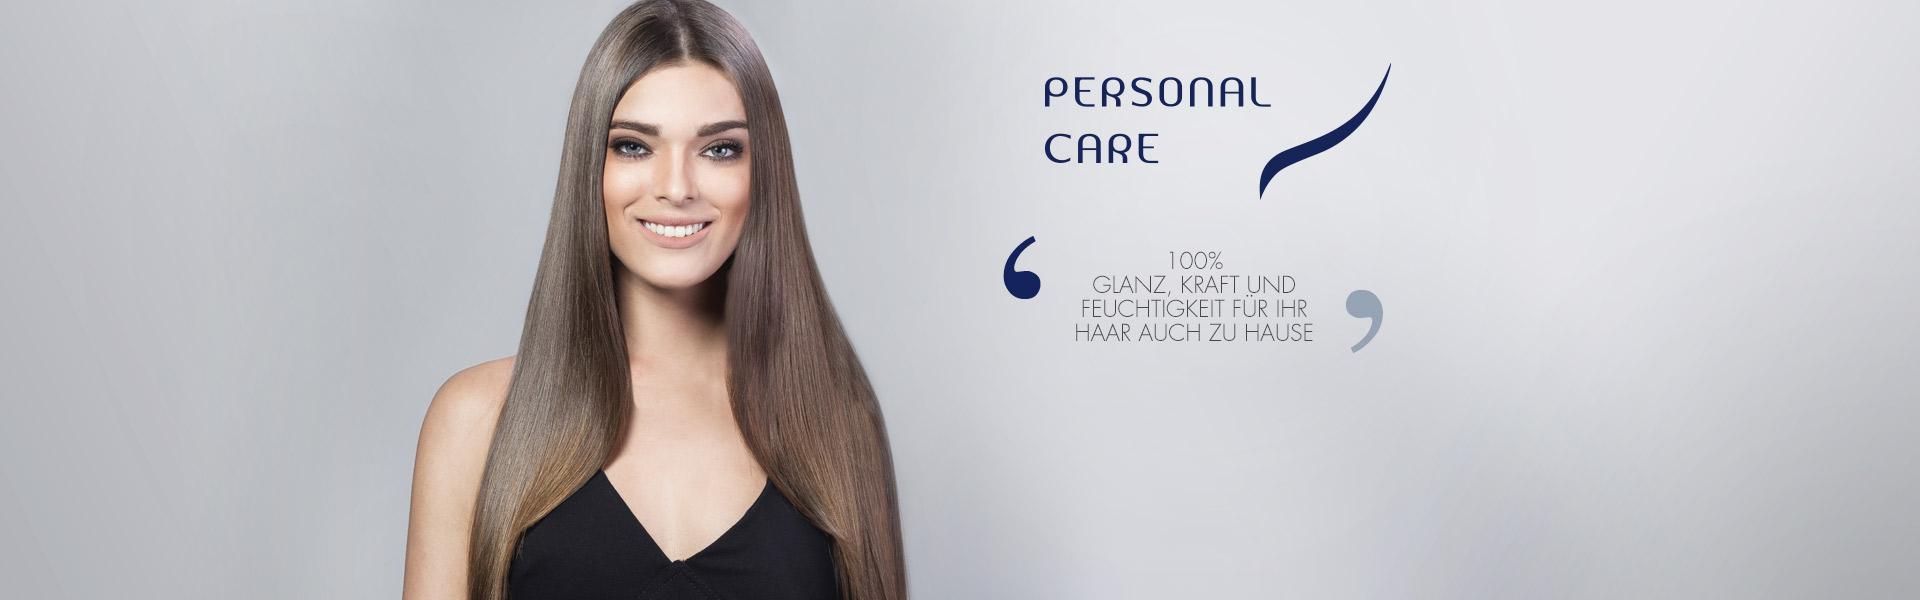 personal care capelli lisci e sani